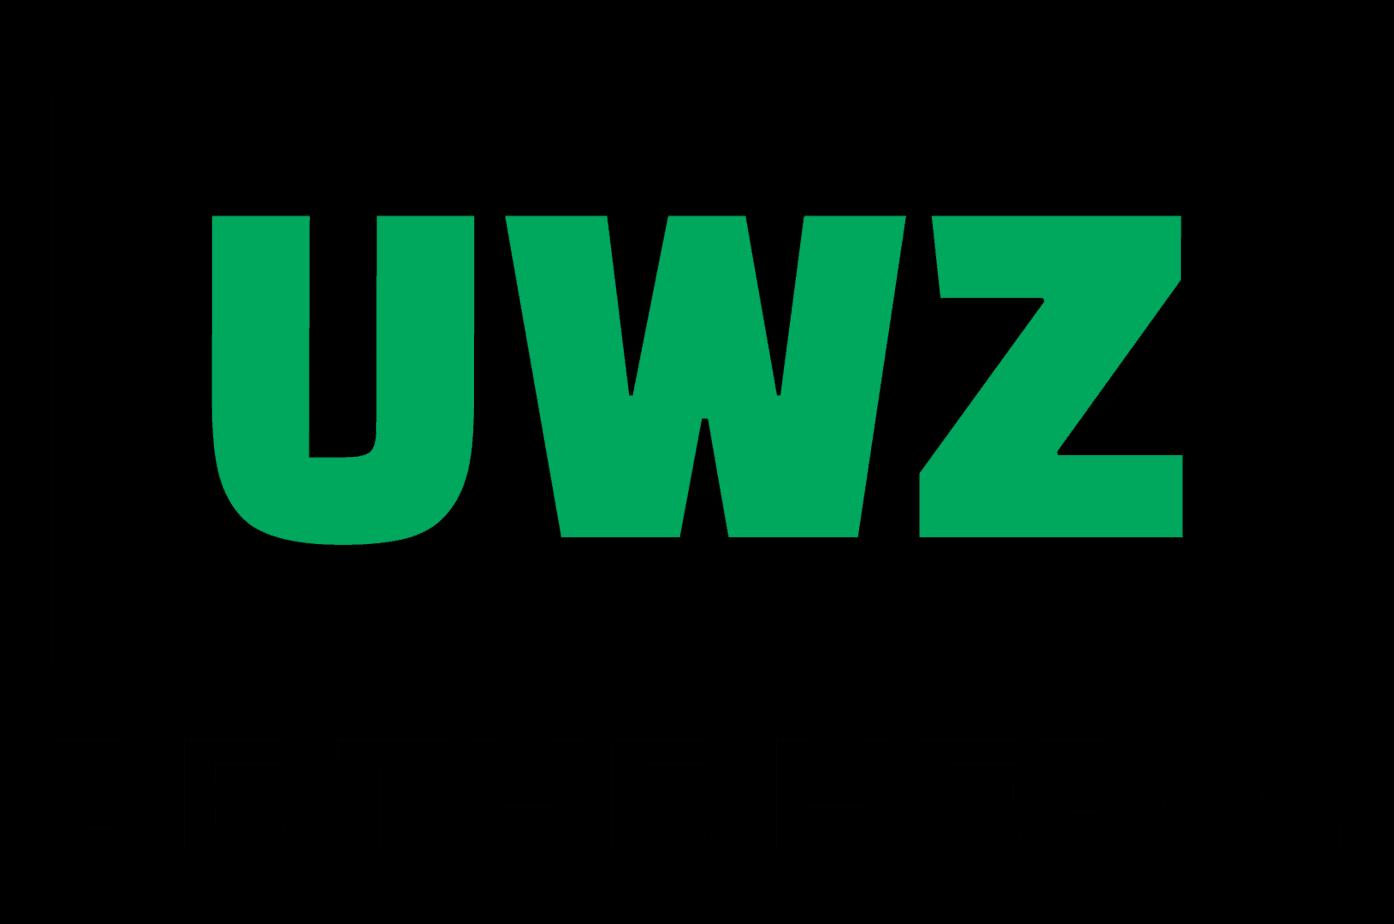 uwz logo